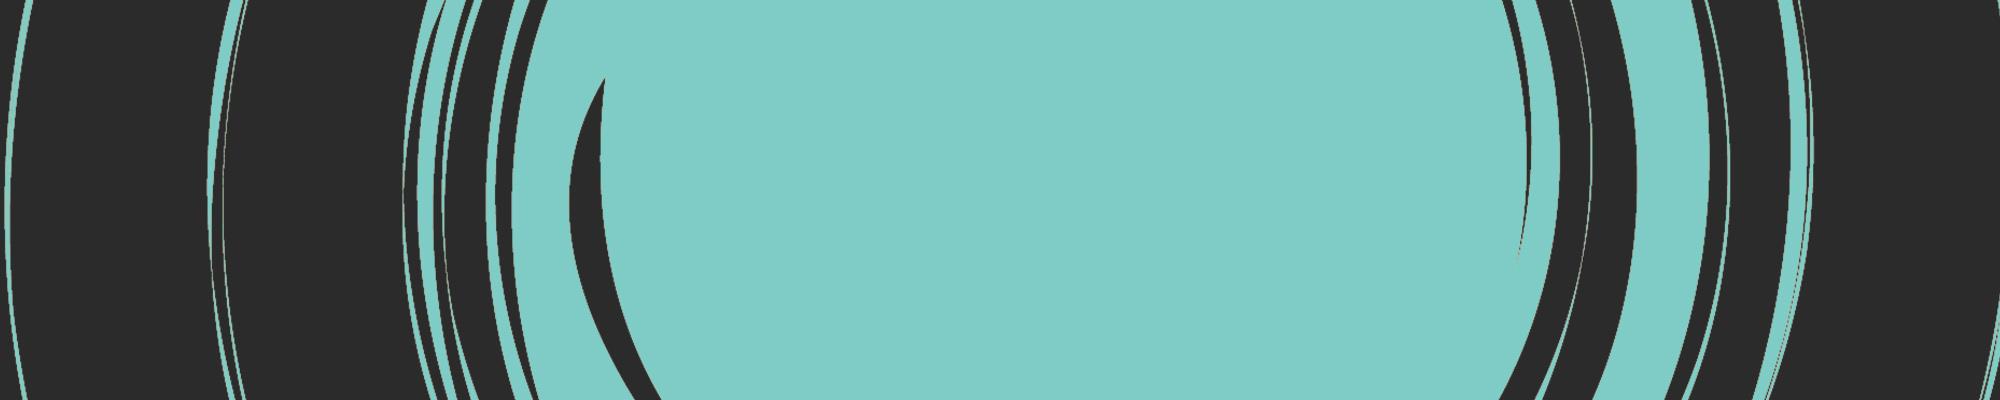 Banner turquoise grey Alison Drury